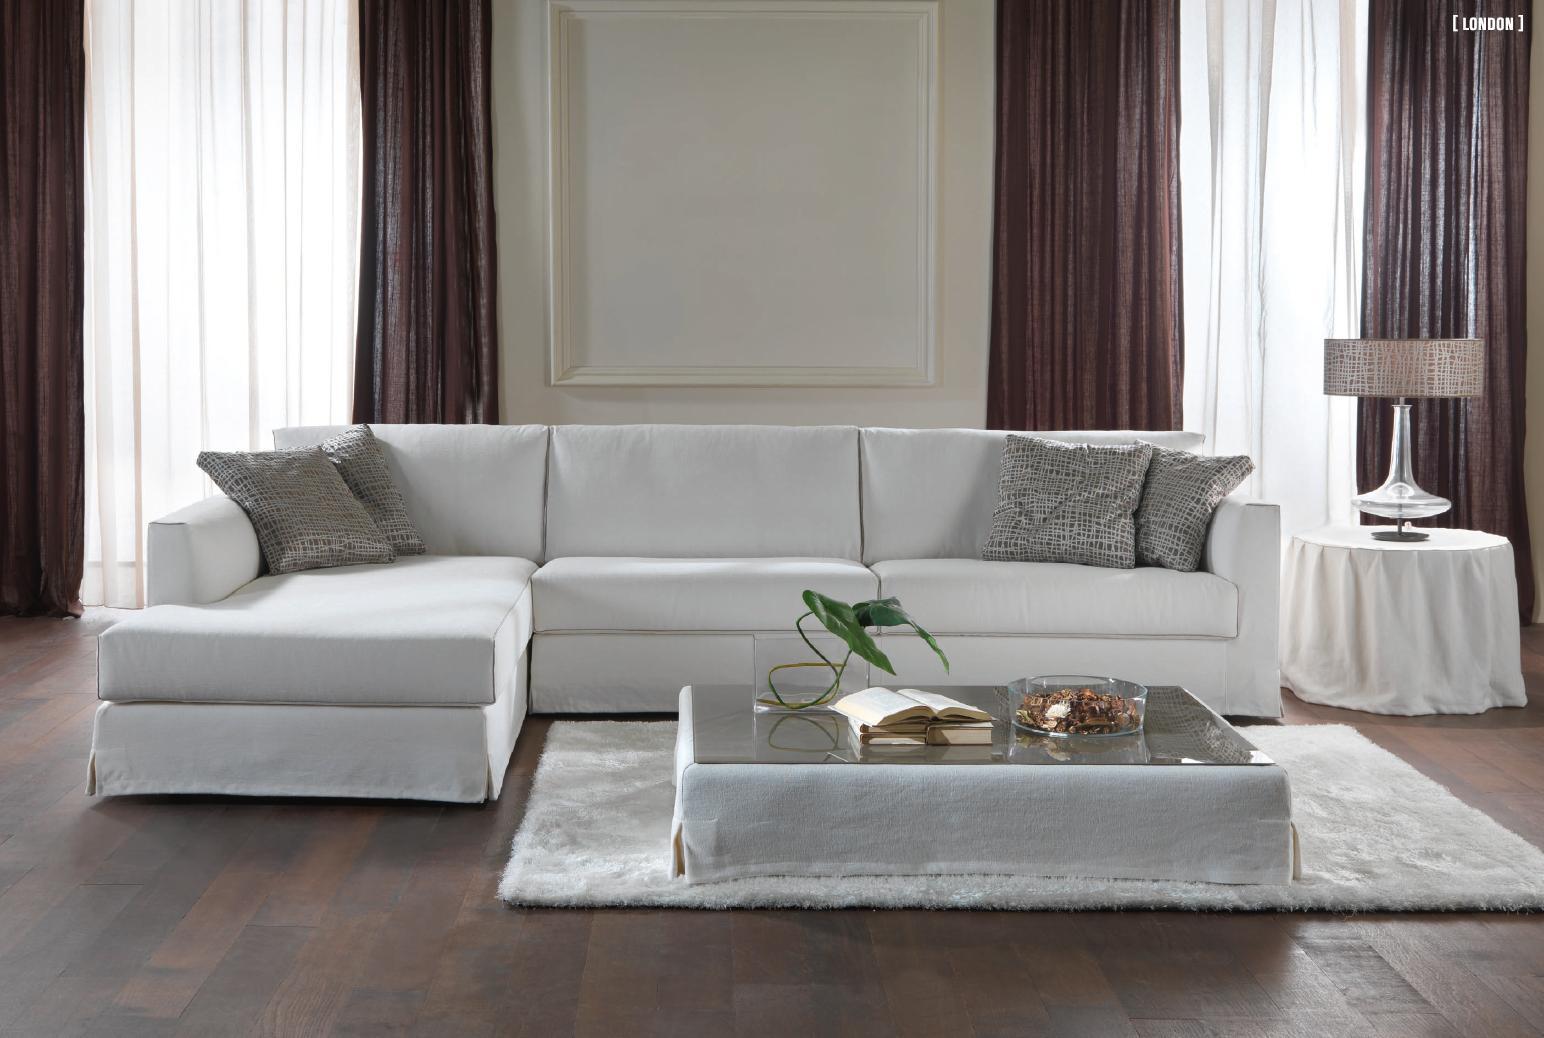 Divano moderno monaco divani moderni salotti divani e for Salotti moderni prezzi